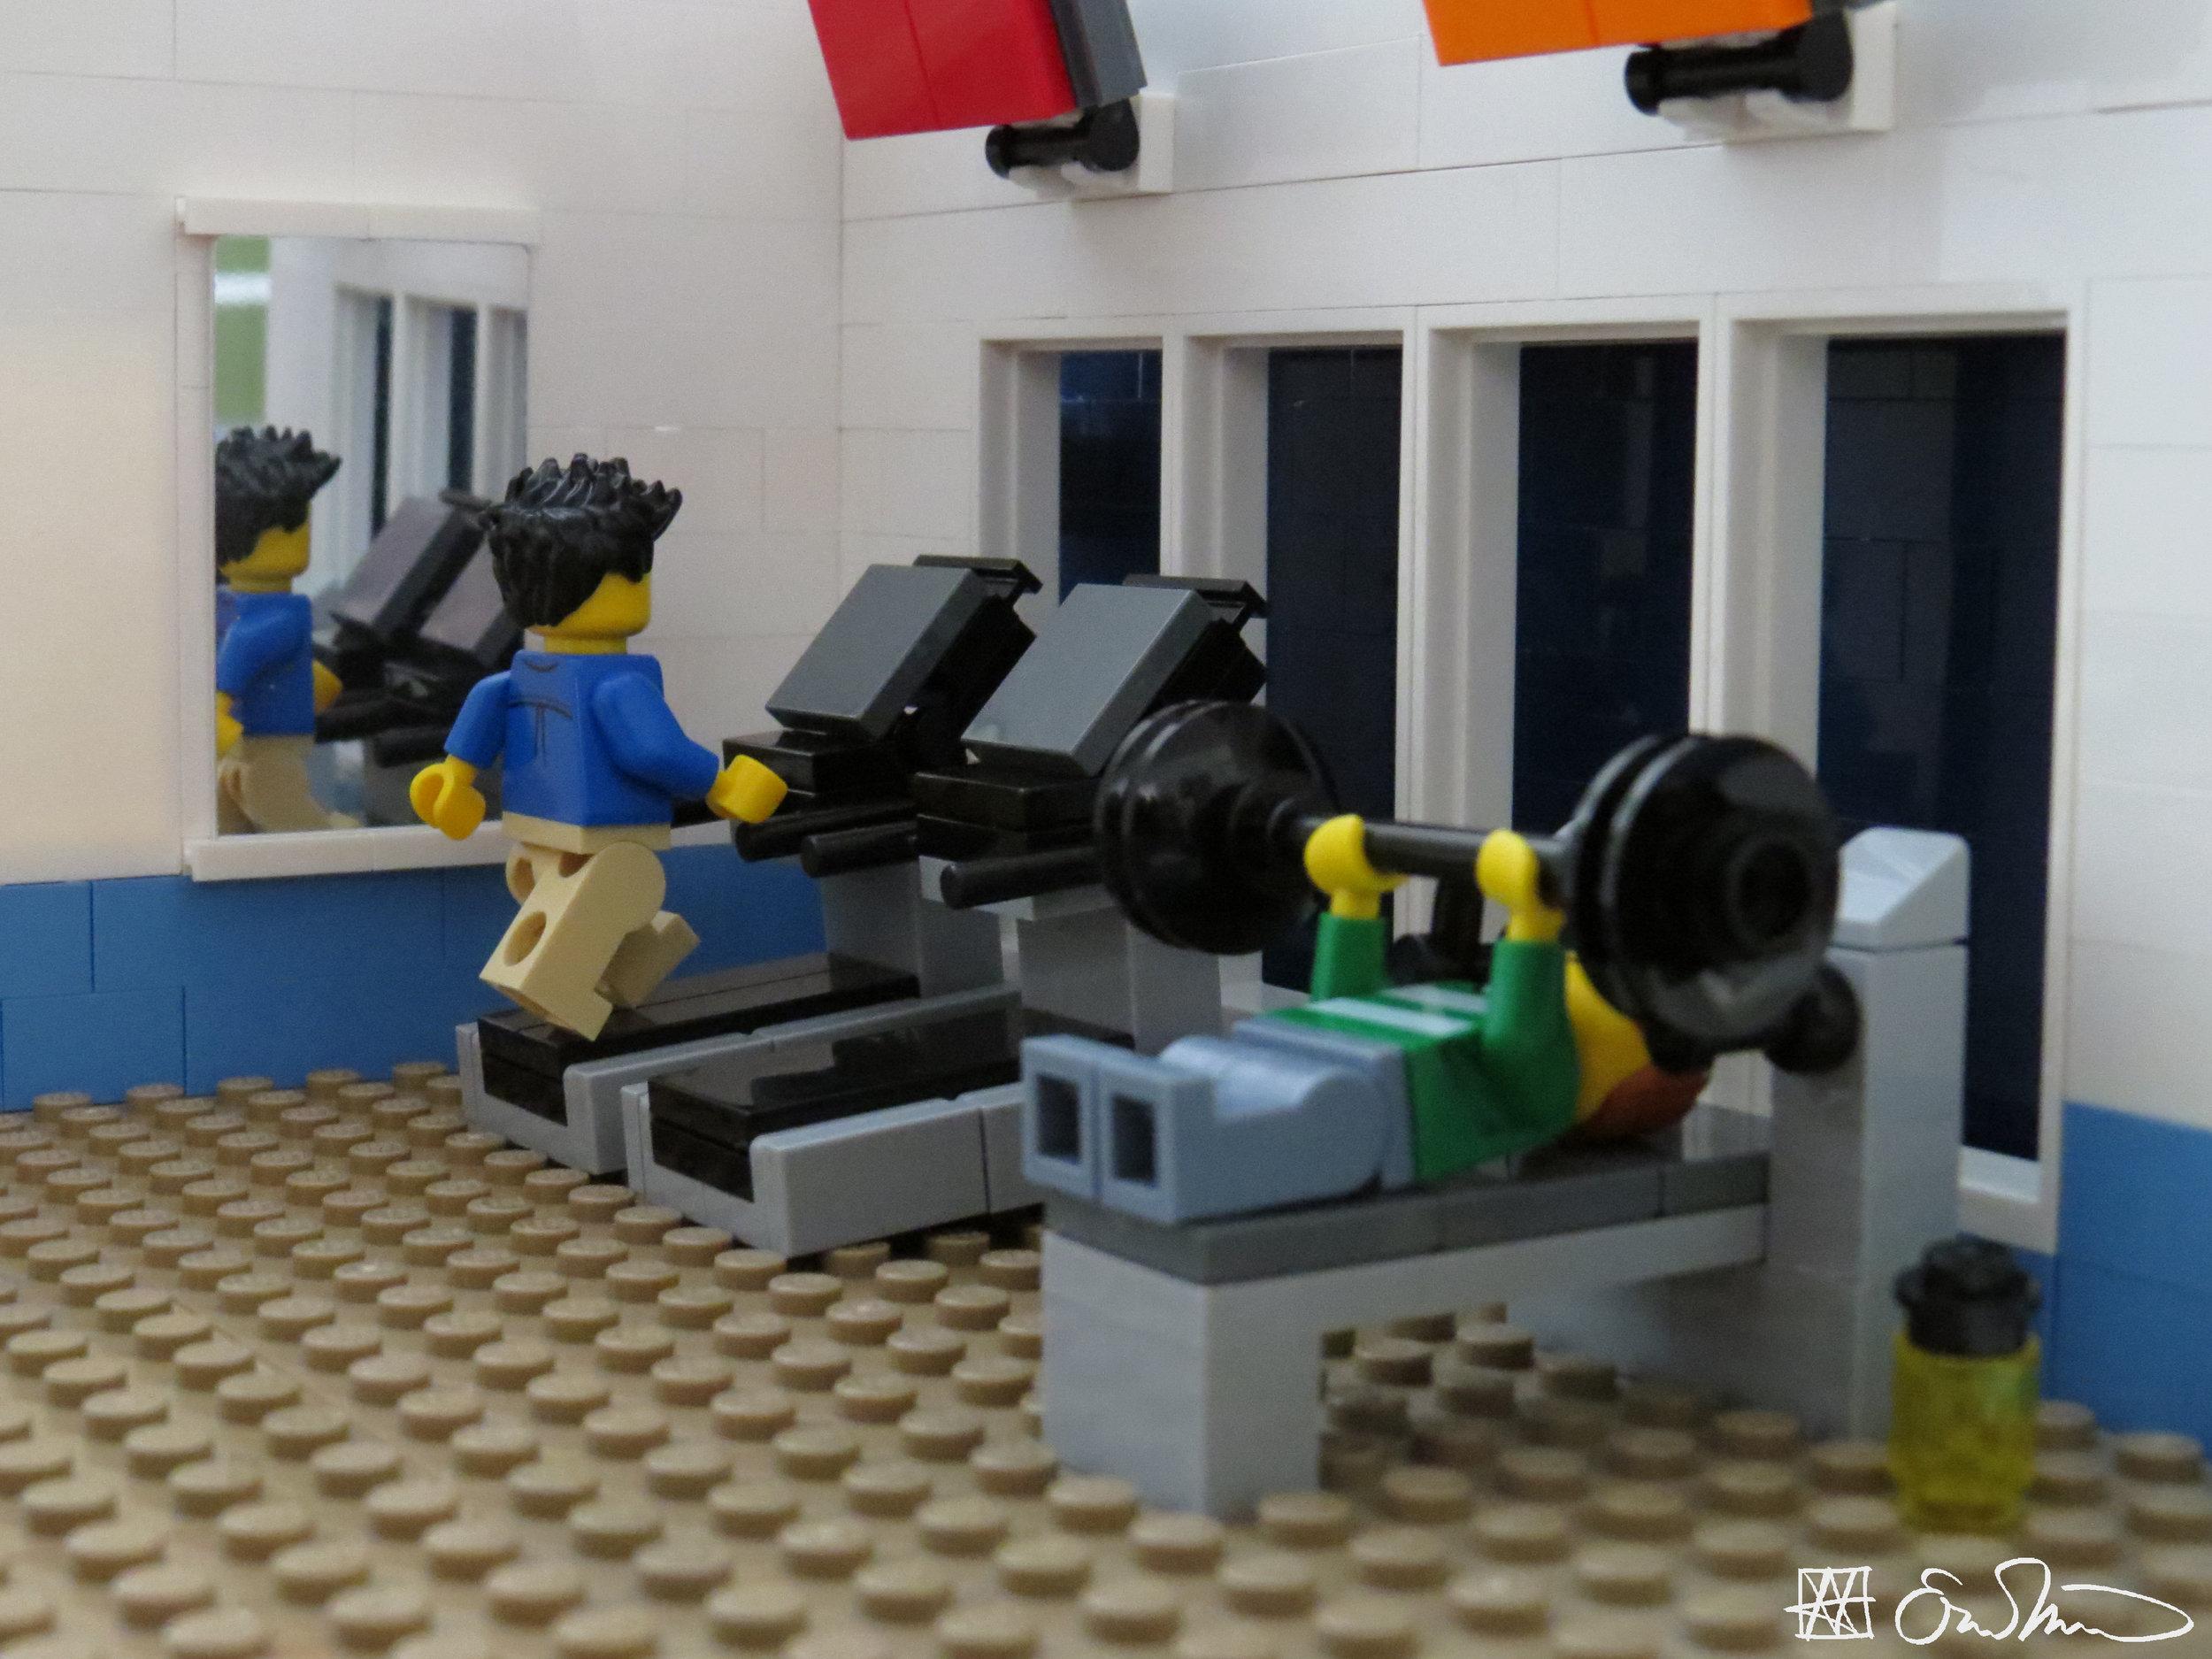 22 - Exercising